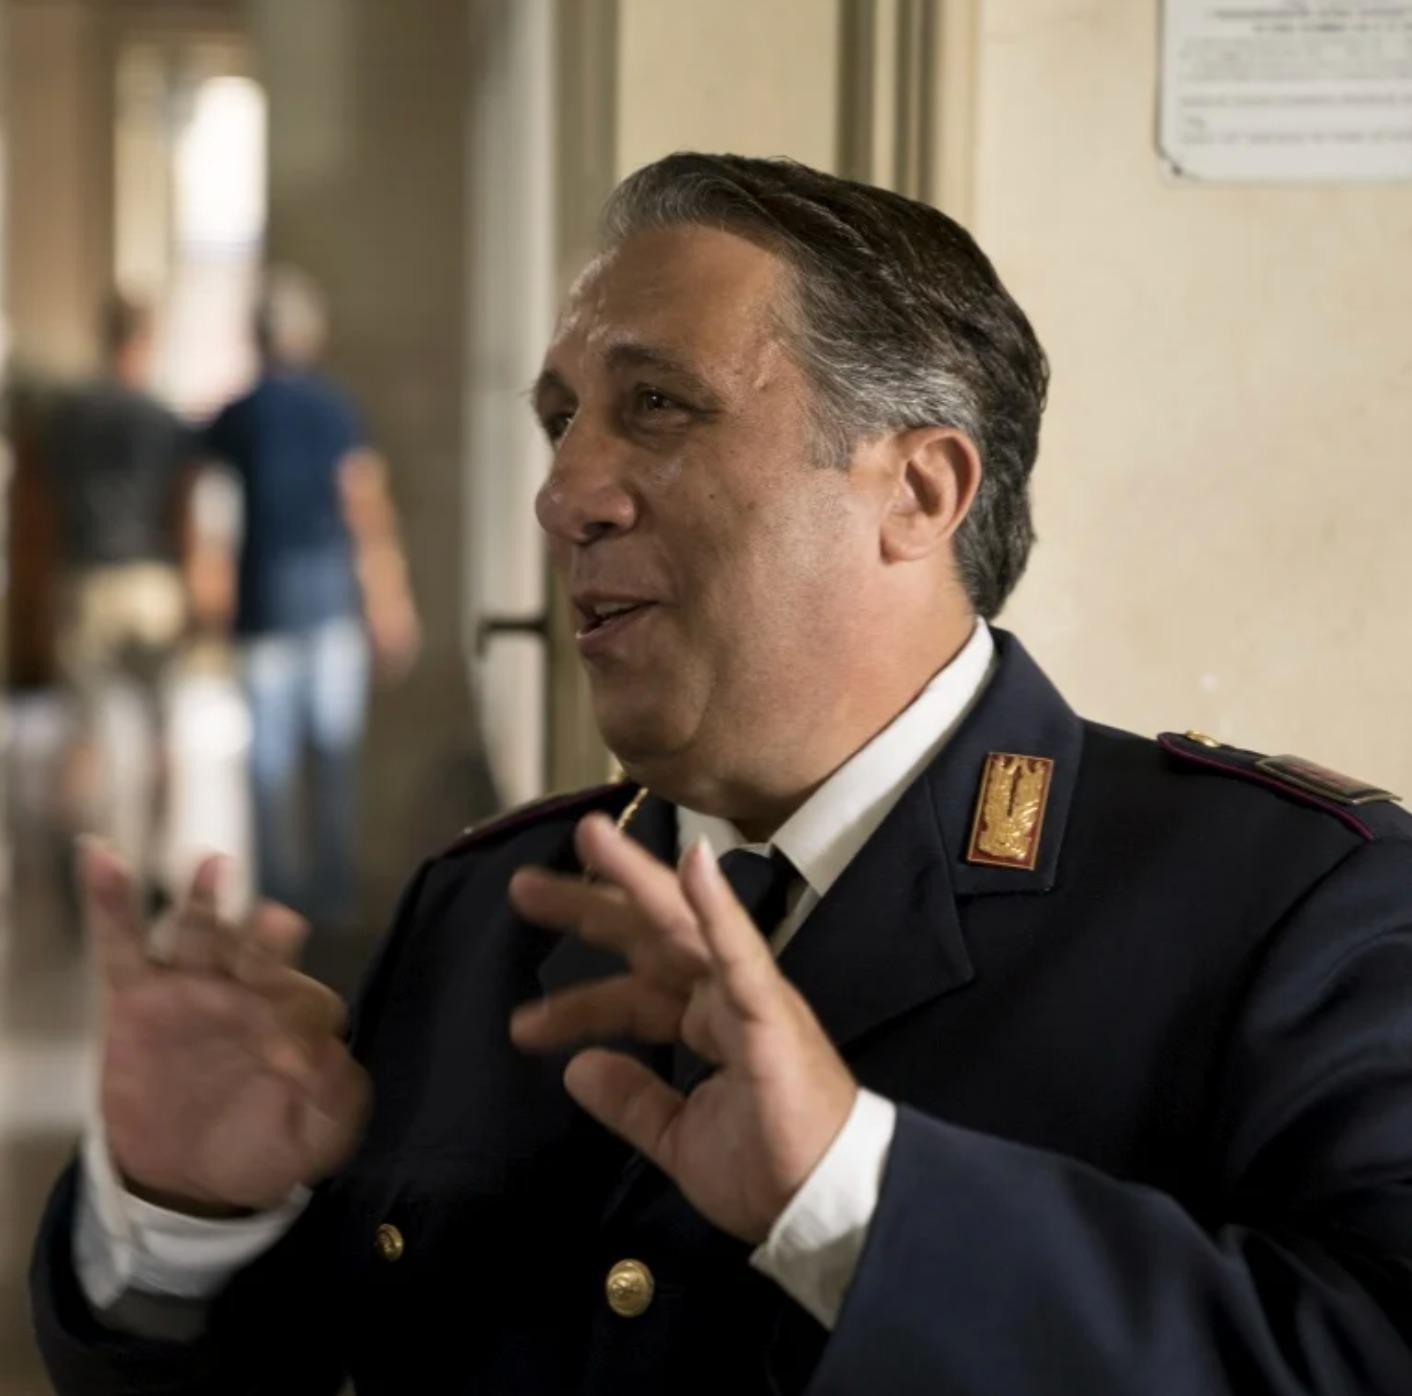 luca zingaretti nuove puntate il commissario montalbano